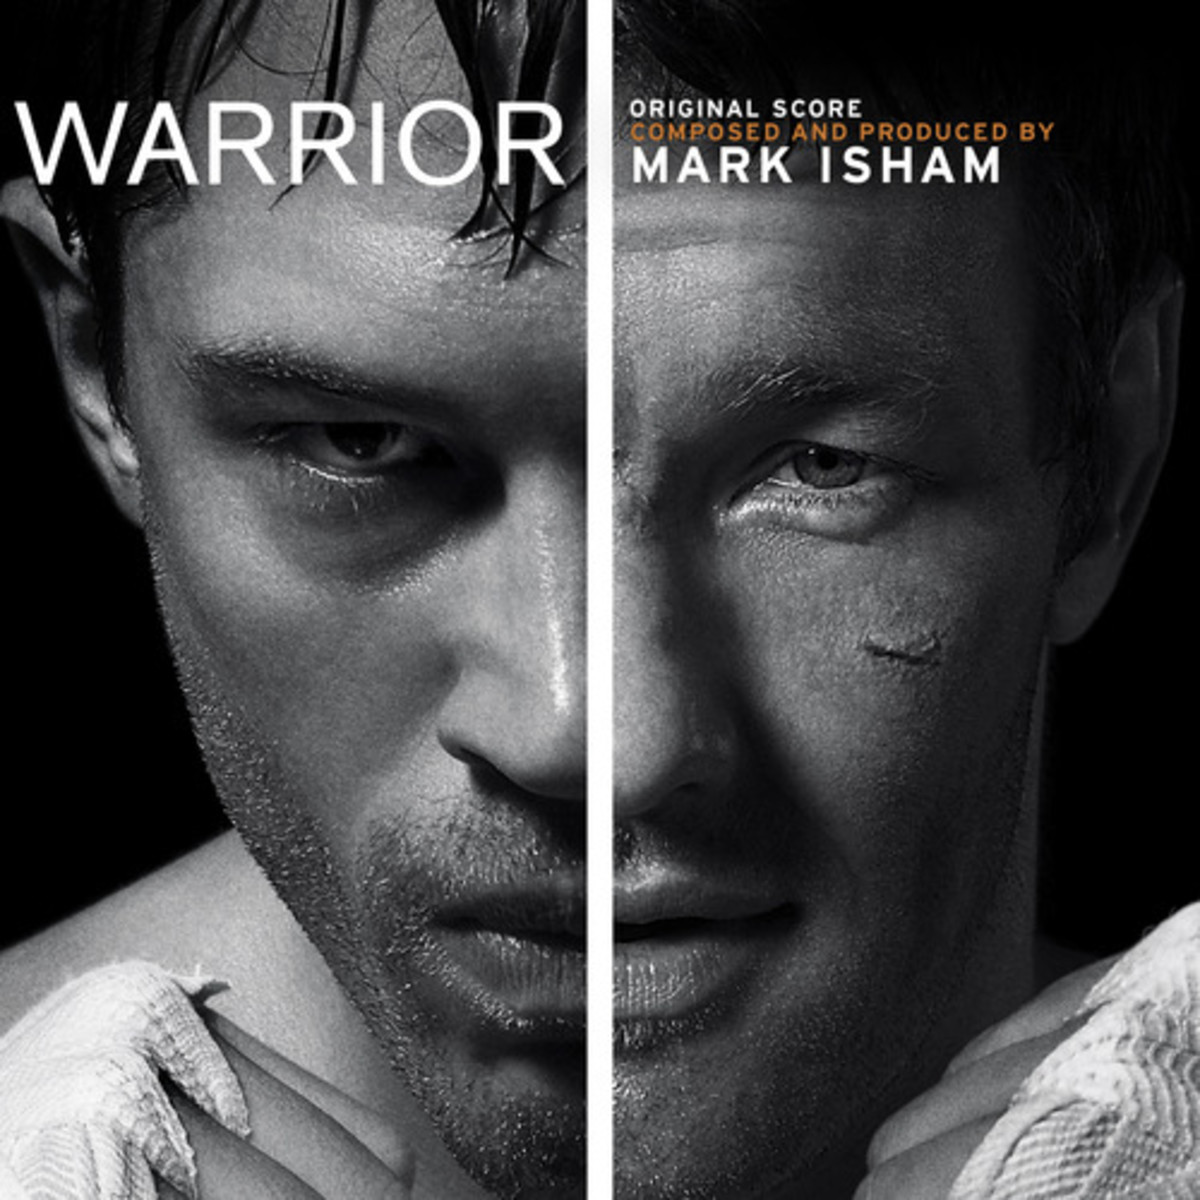 Warrior Soundtrack